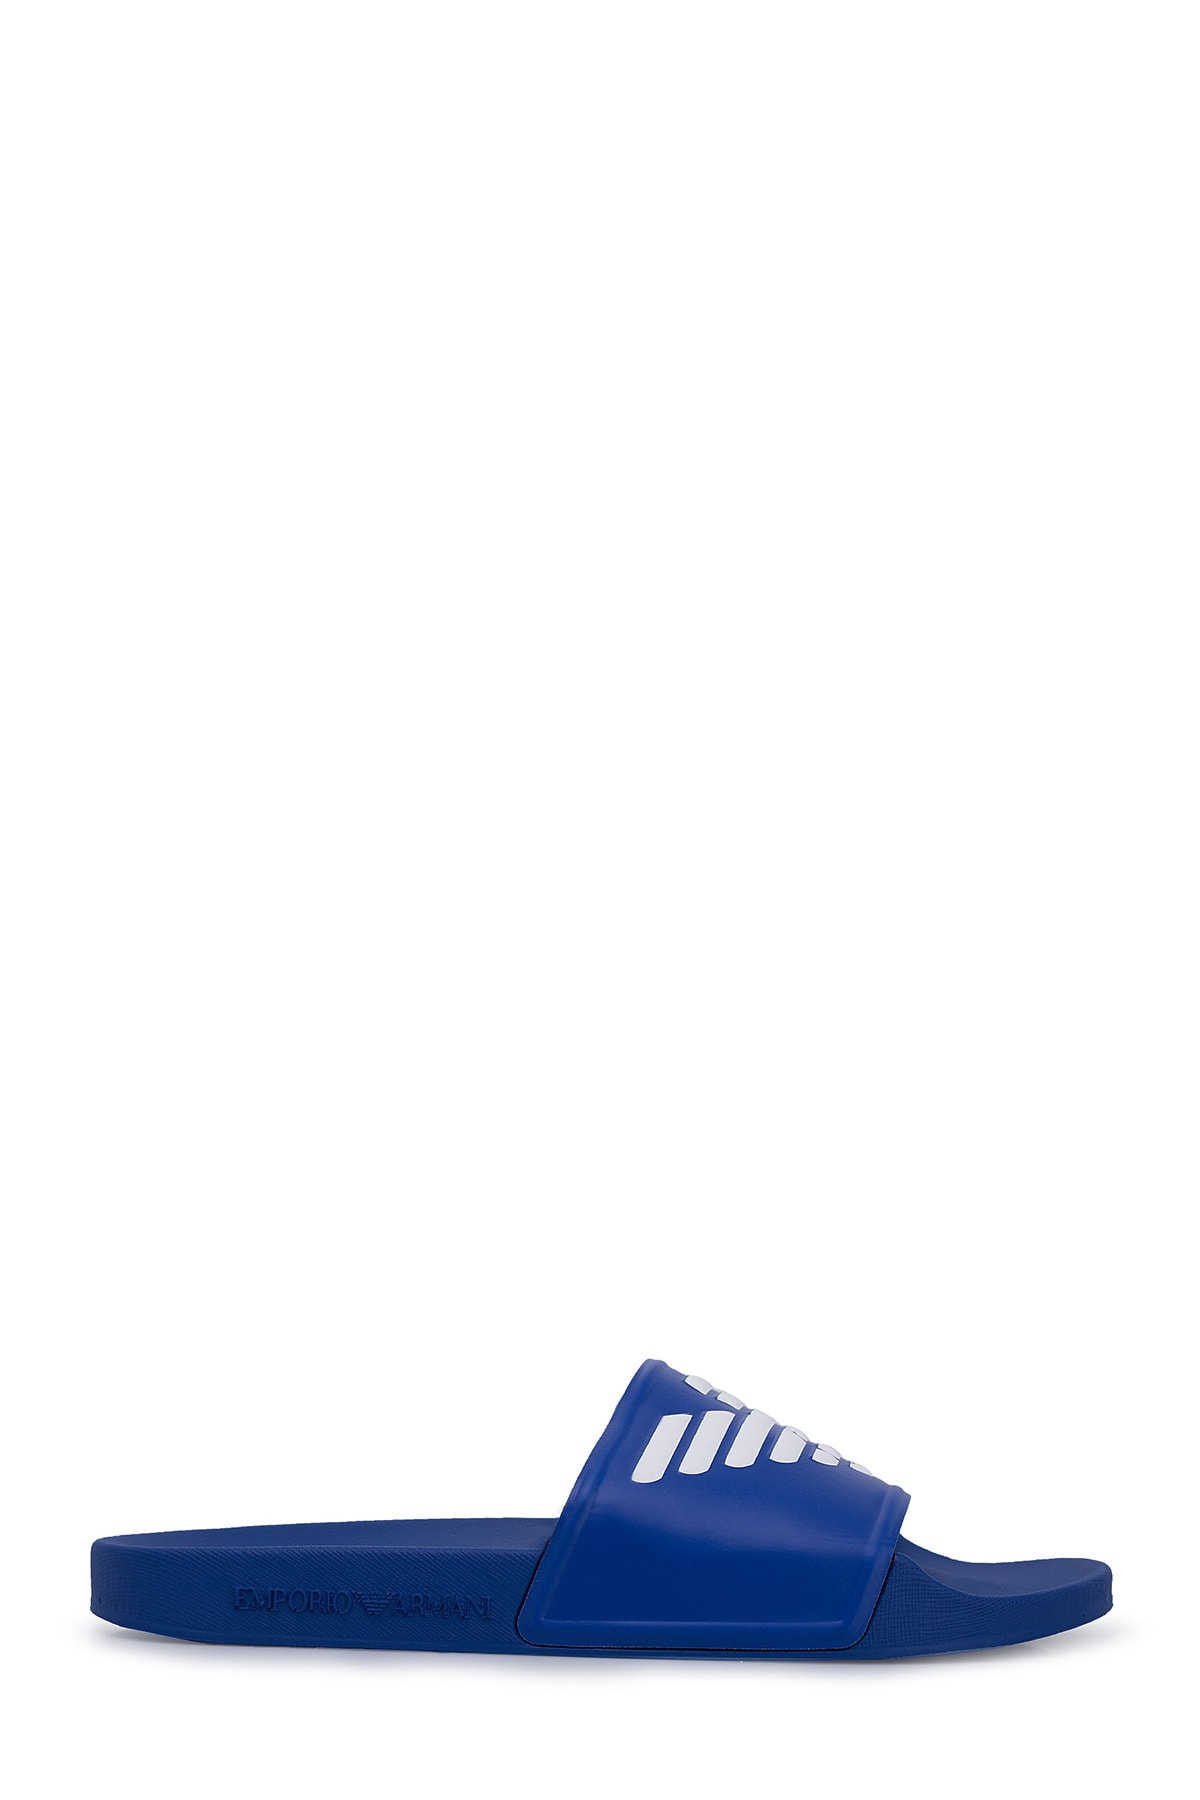 Emporio Armani Erkek Lacivert Terlik X4ps01 Xl828 M592 1